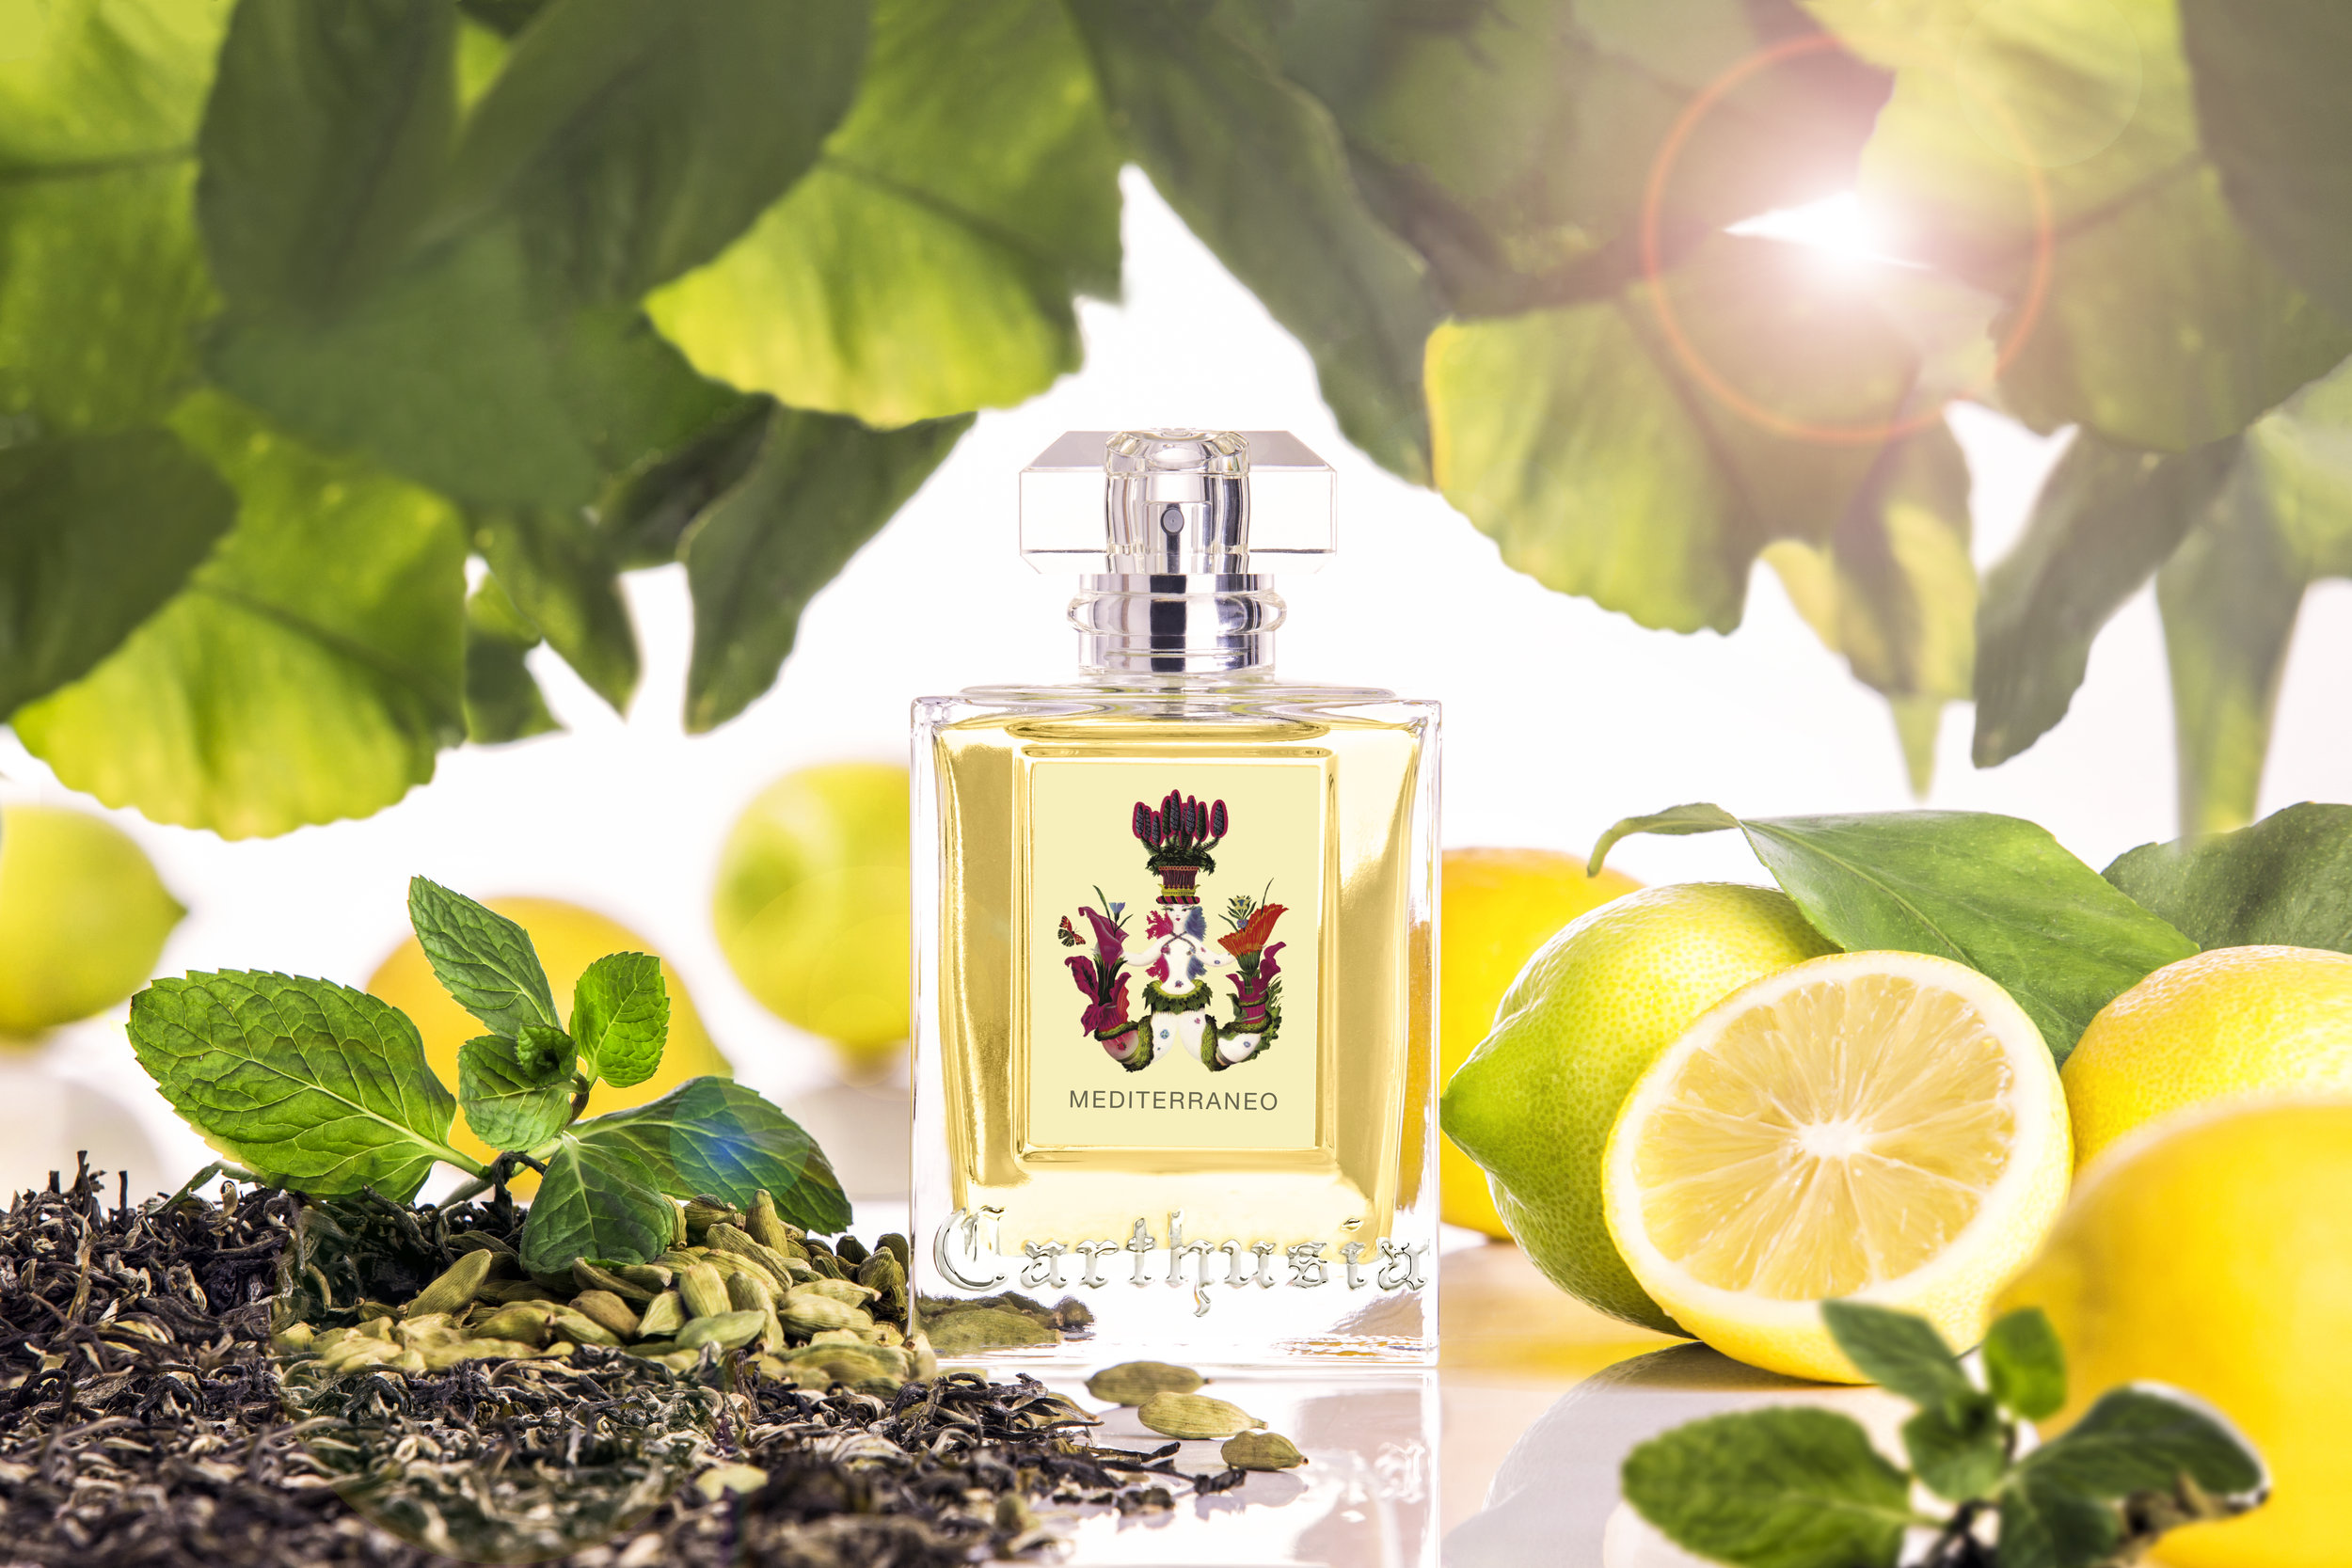 Mediterraneo Eau de Parfum